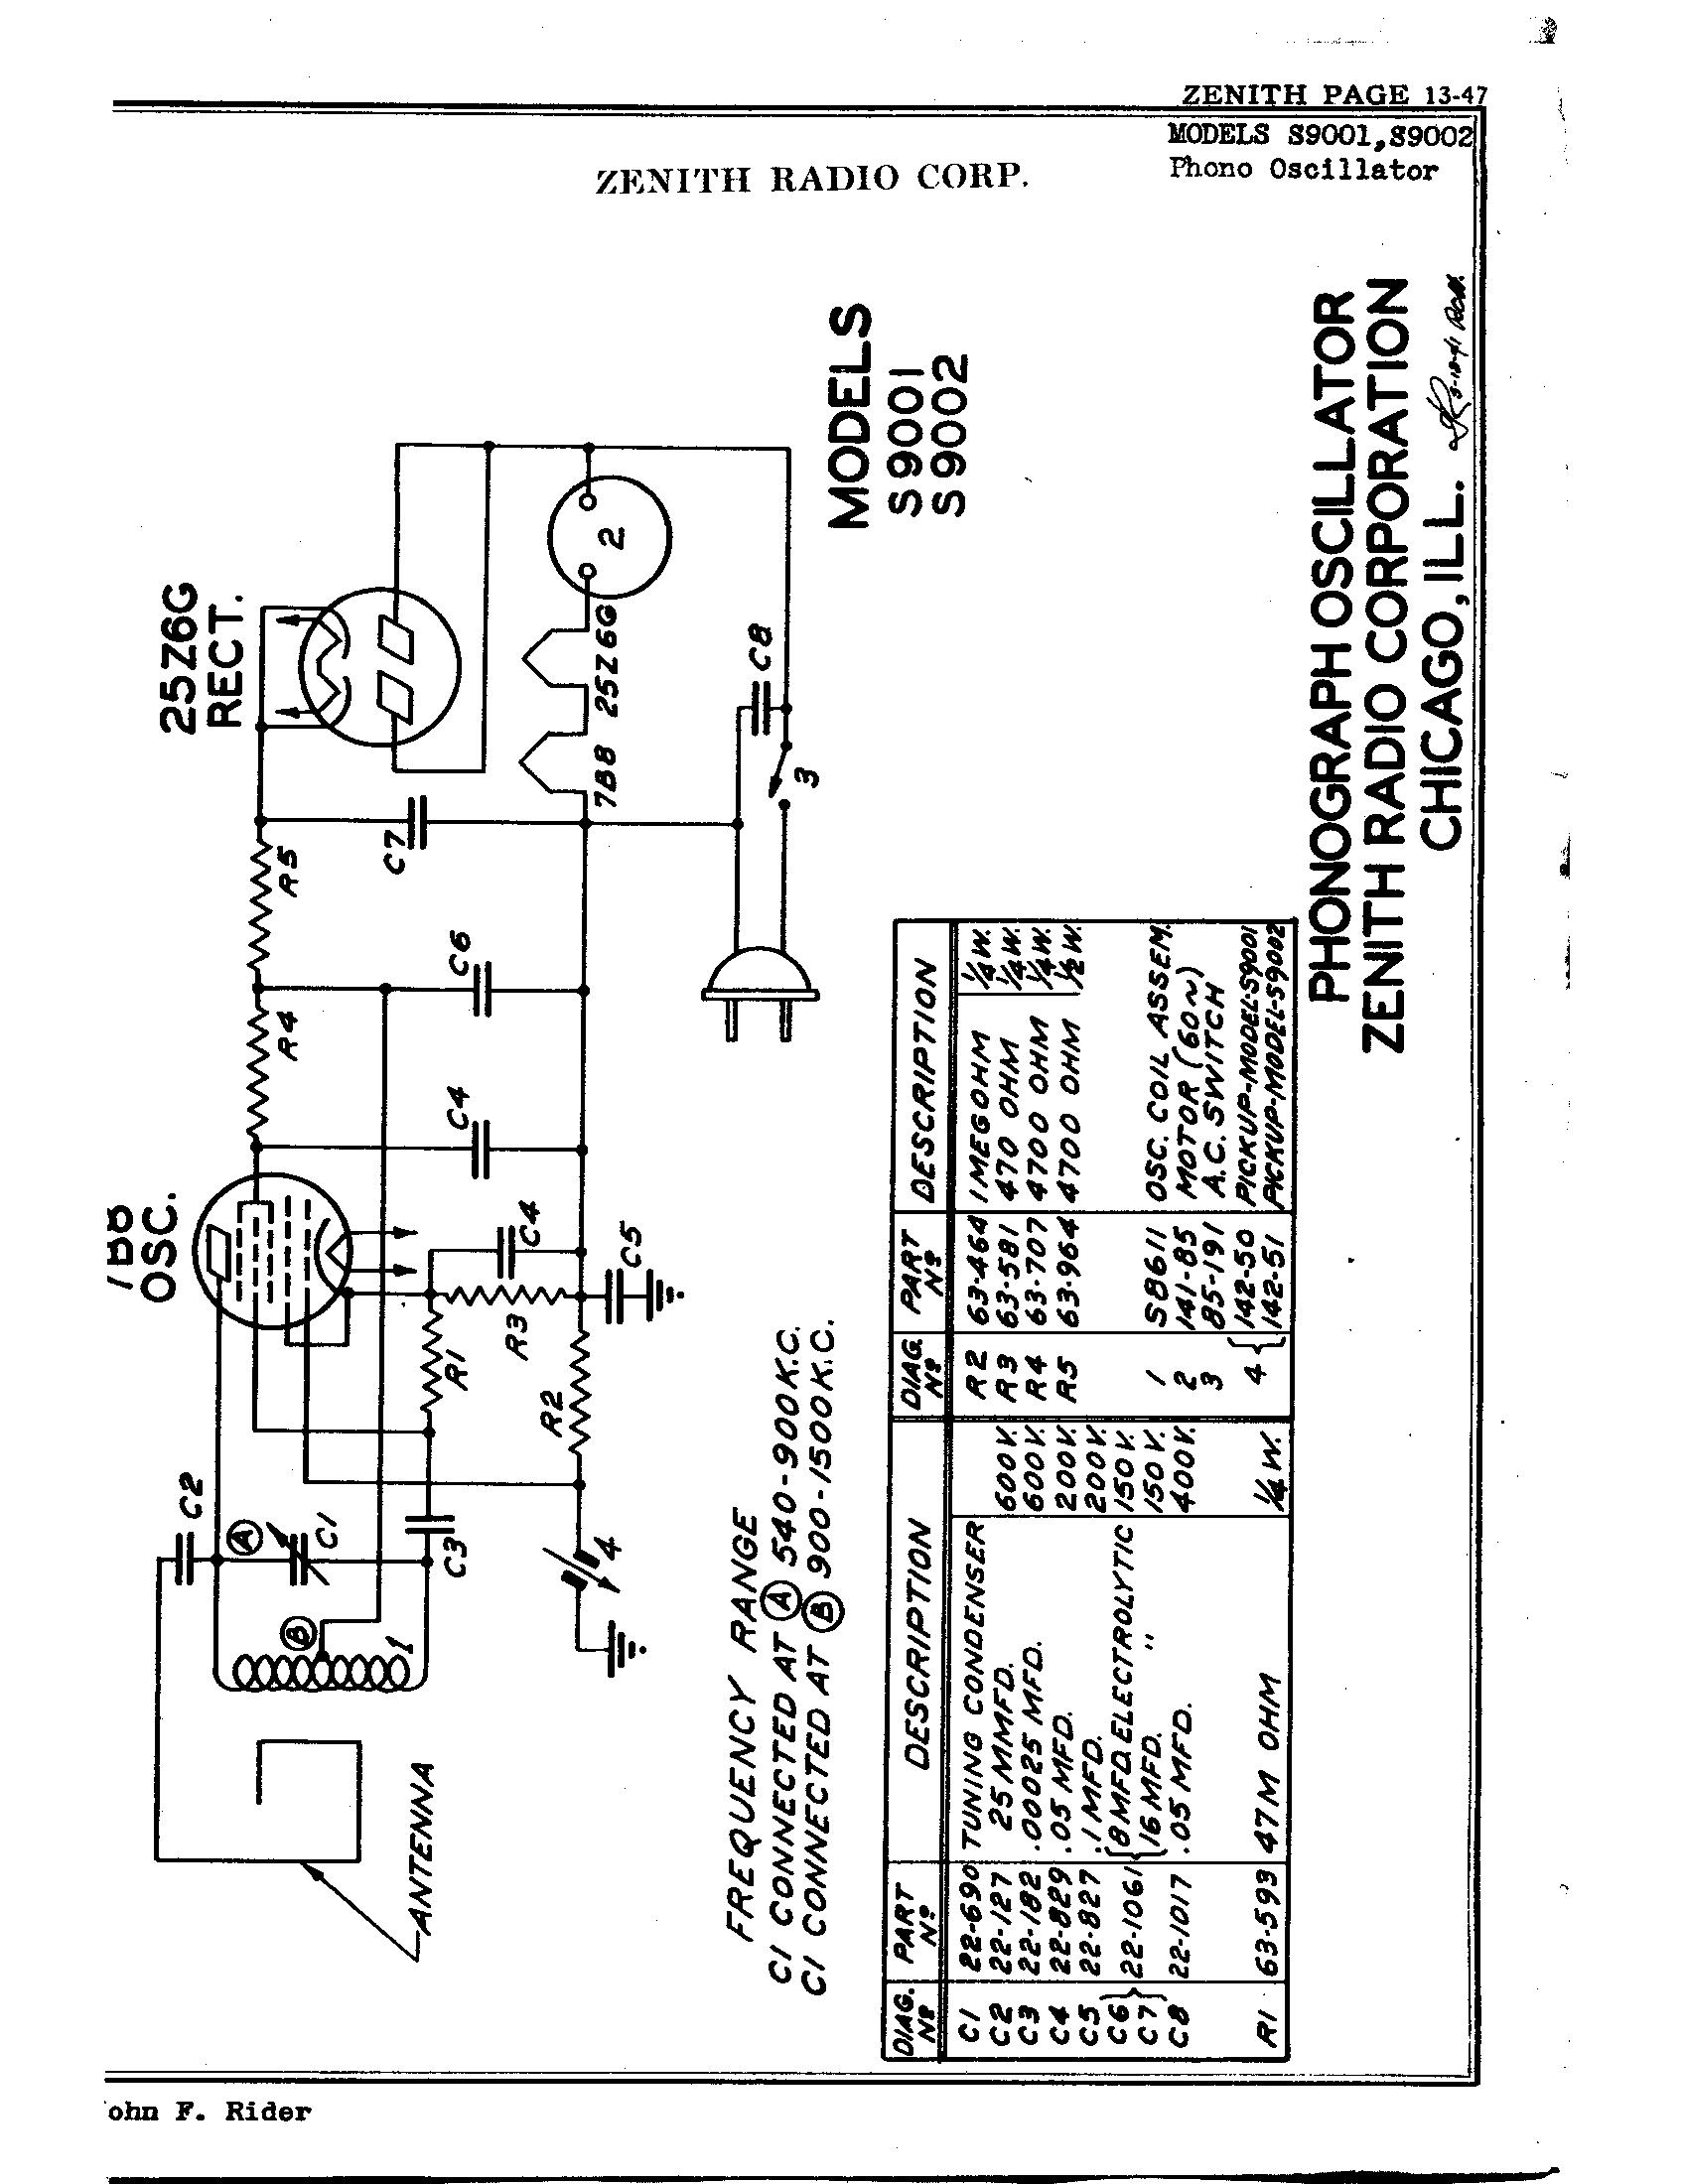 Zenith Radio Corp Phono Oscillator